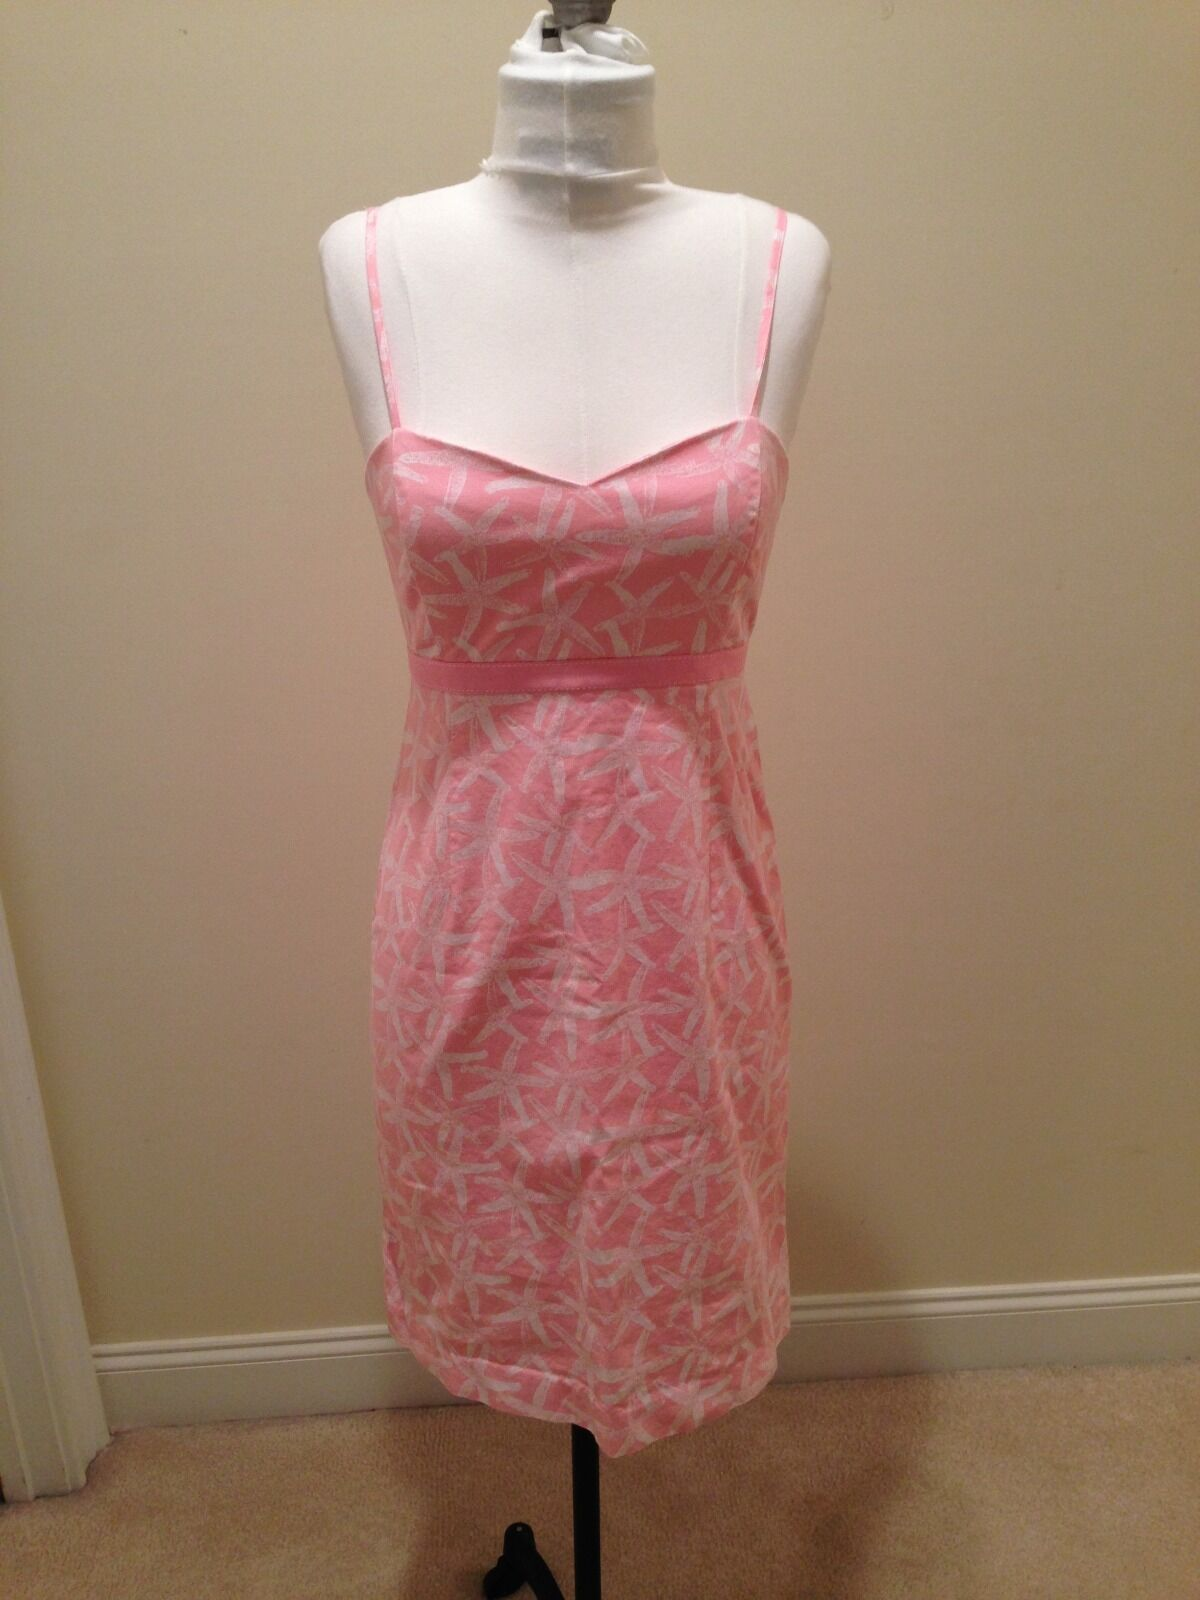 Vineyard Vines Pink and White Starfish Print Cotton Spaghetti Strap Dress Size 6